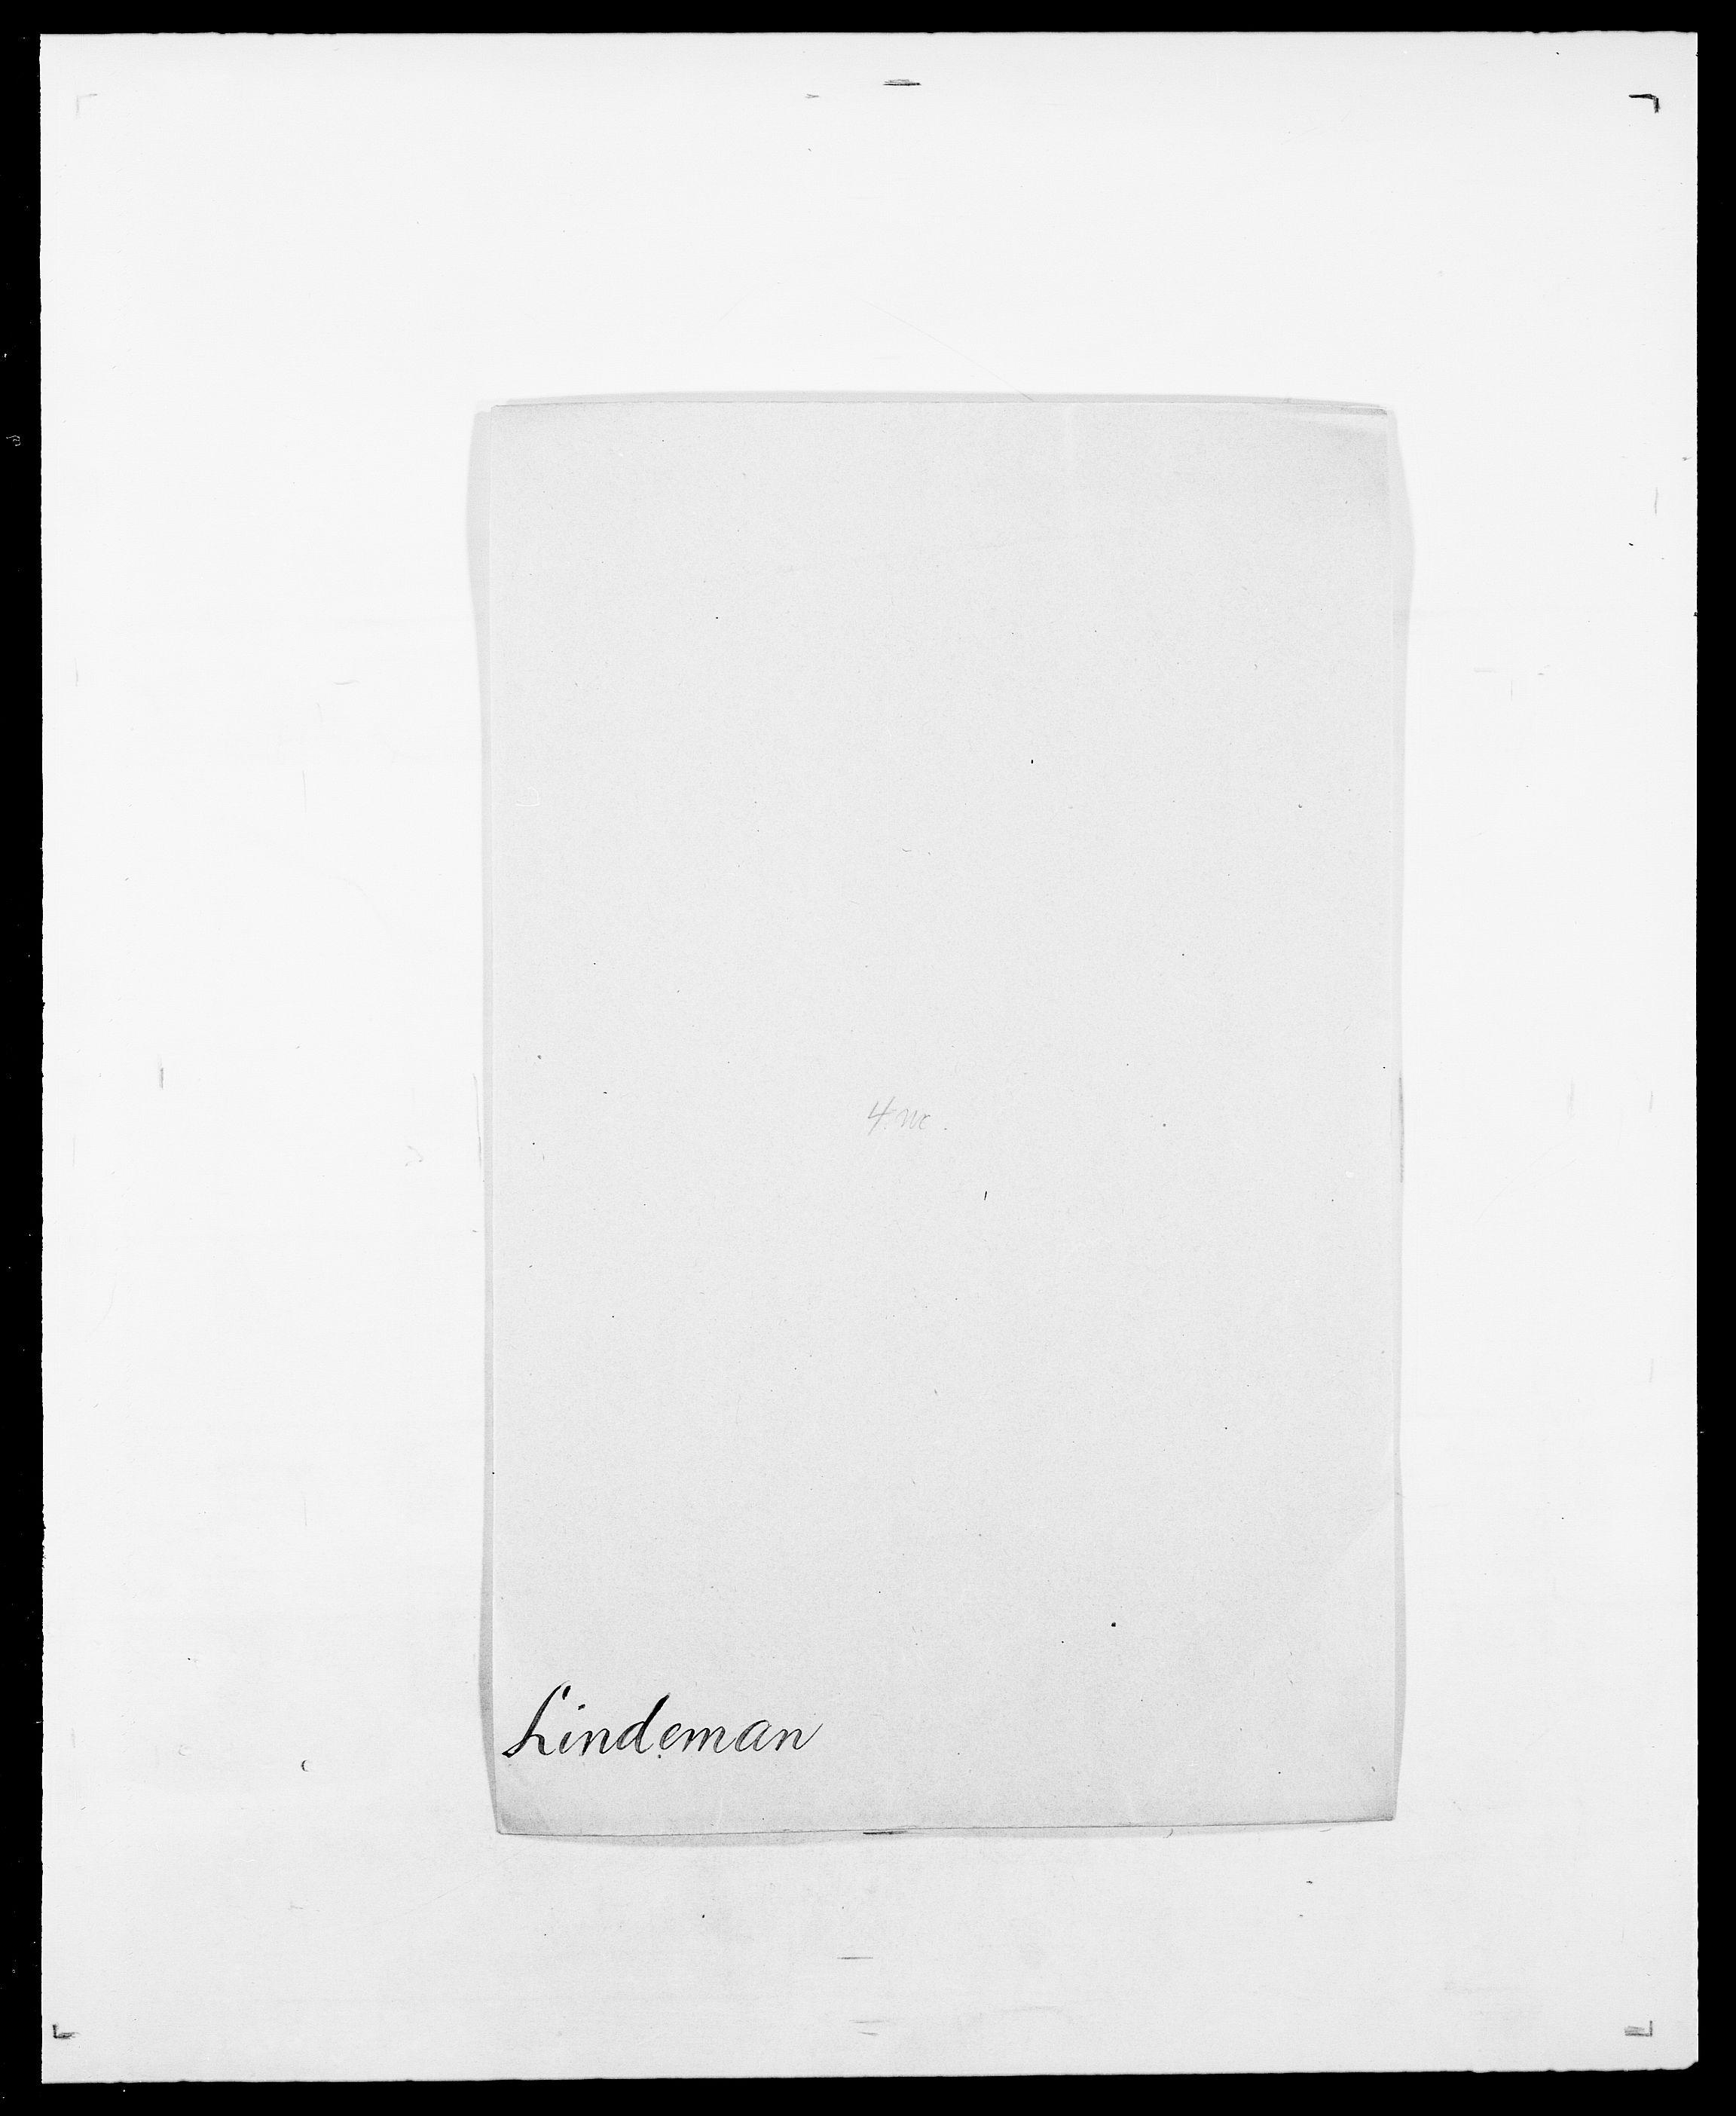 SAO, Delgobe, Charles Antoine - samling, D/Da/L0023: Lau - Lirvyn, s. 592